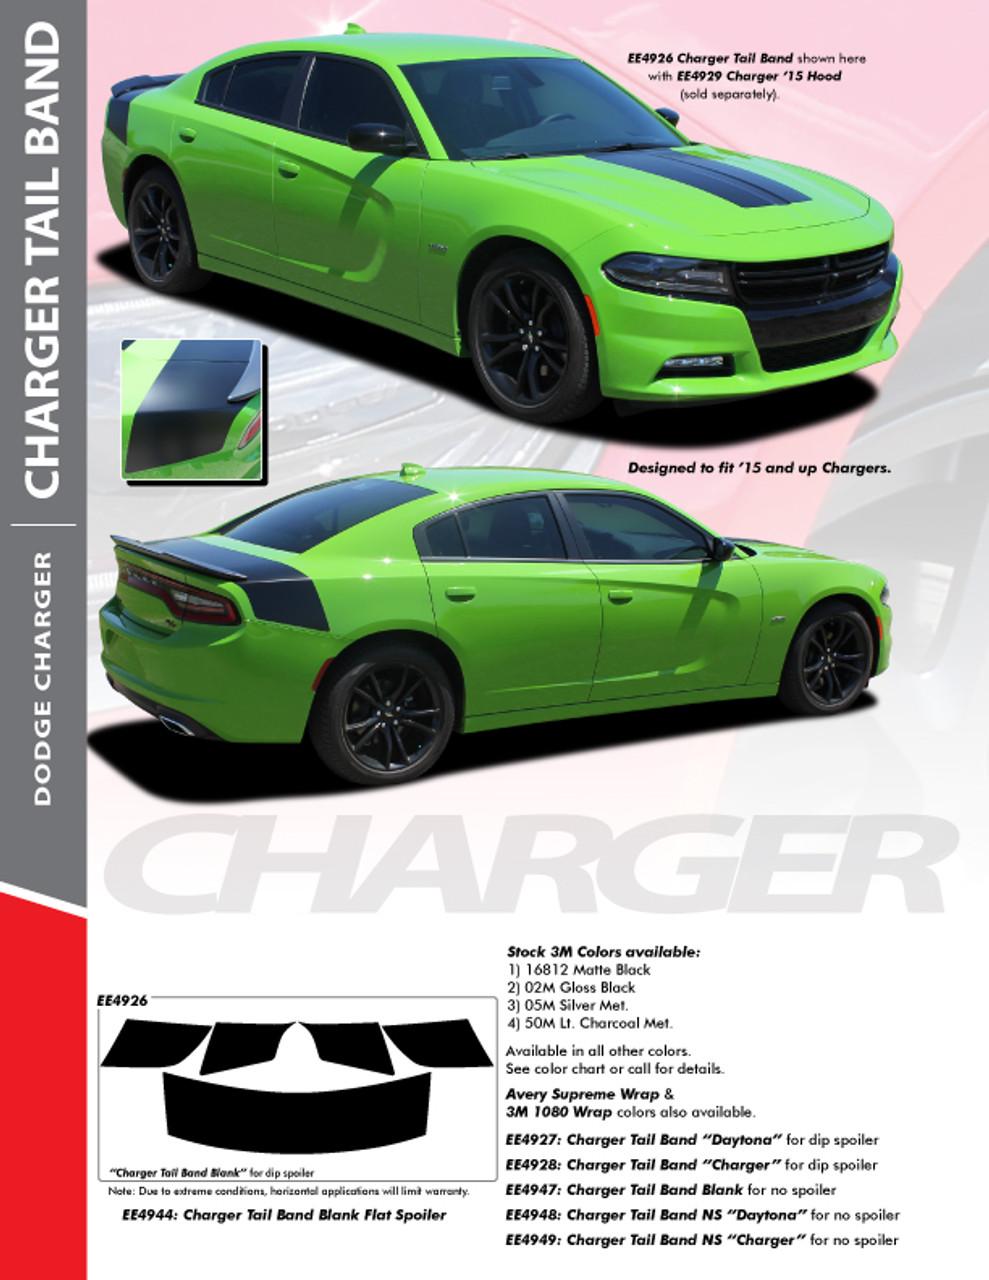 Dodge Charger R//T Hell Cat SRT SXT Rear Quarter Panel Decal Stripes 2011-2014